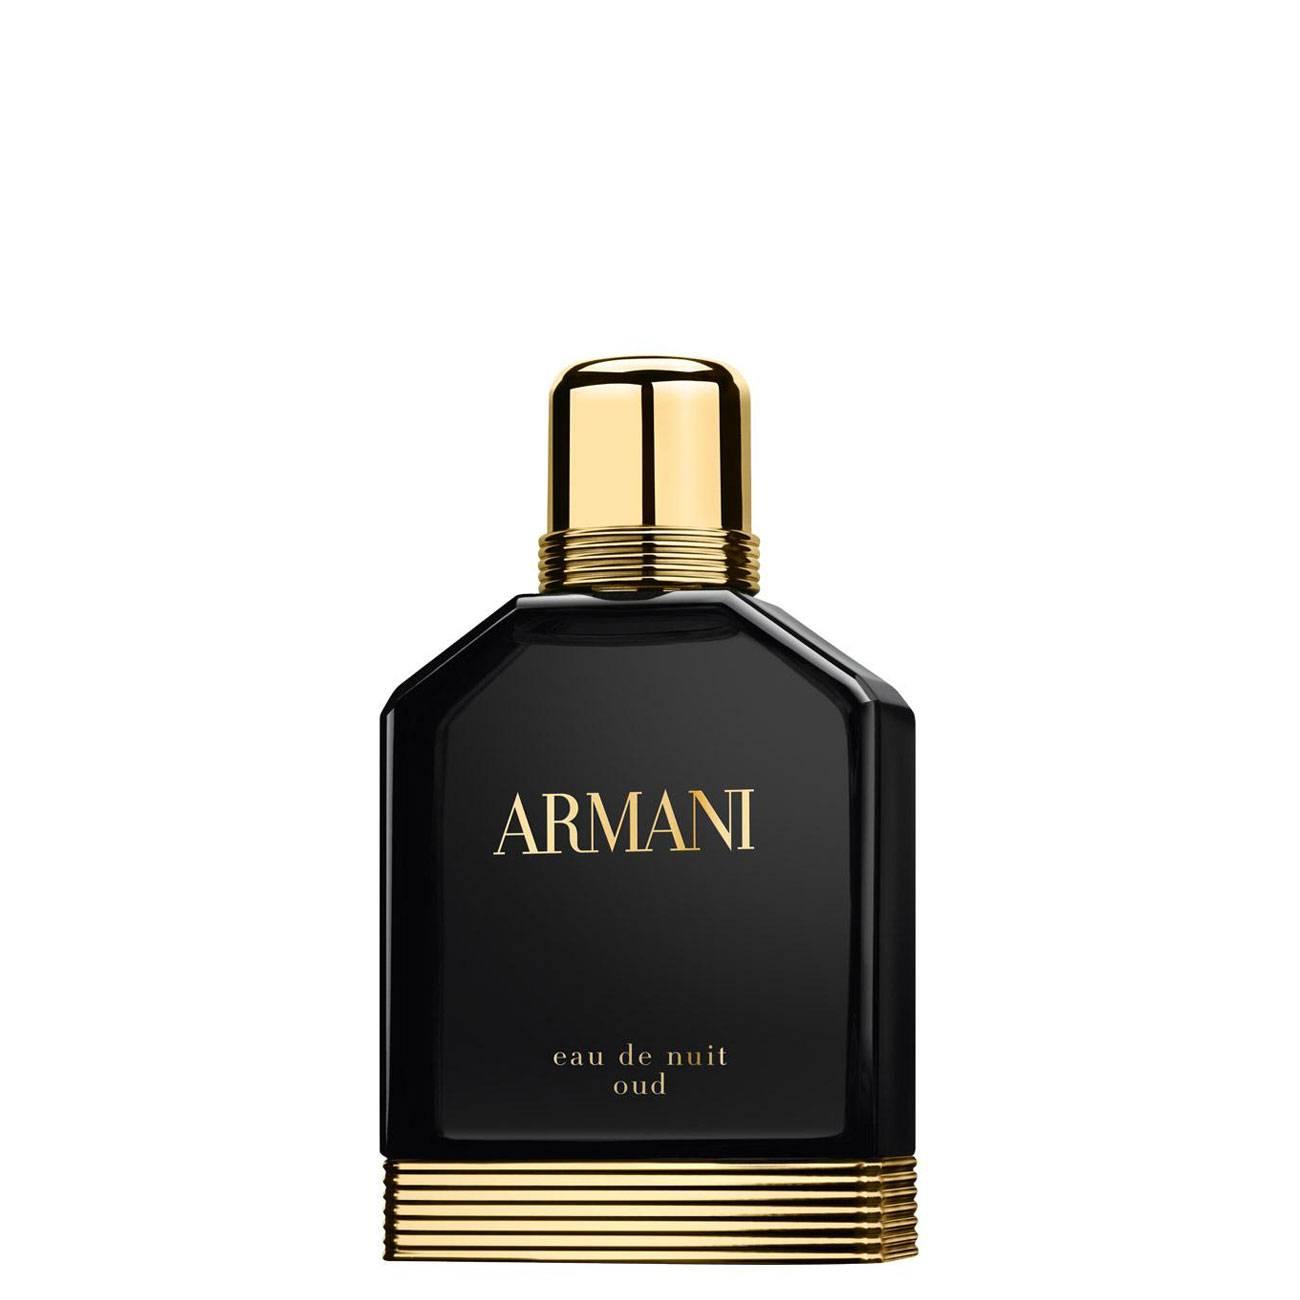 Eau De Nuit Oud 50 Ml 50ml Giorgio Armani imagine 2021 bestvalue.eu